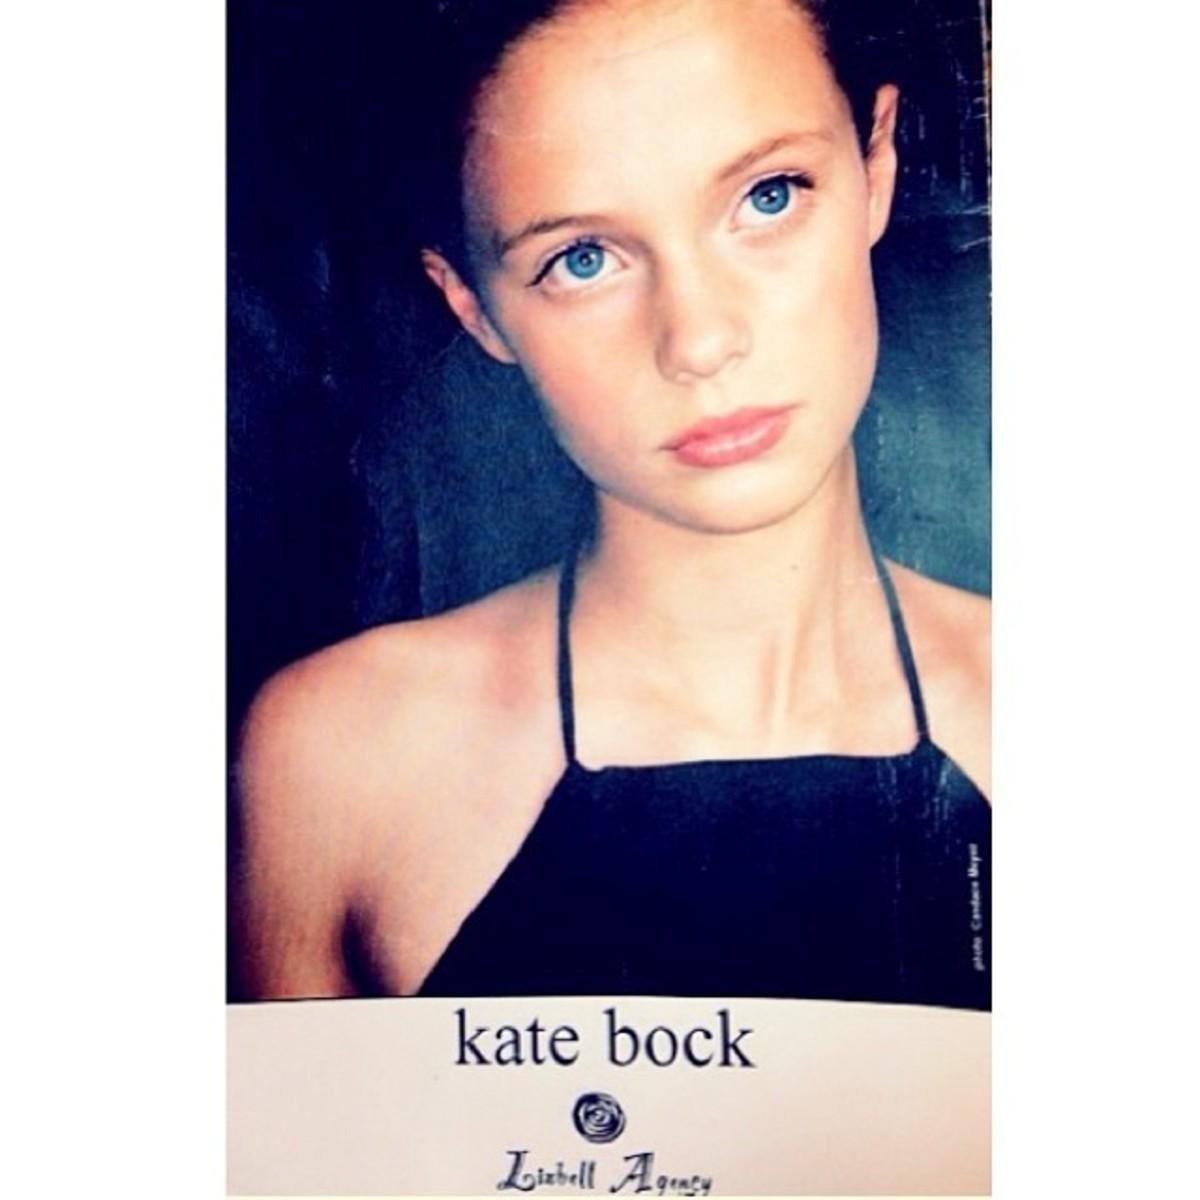 kate-bock2.jpg